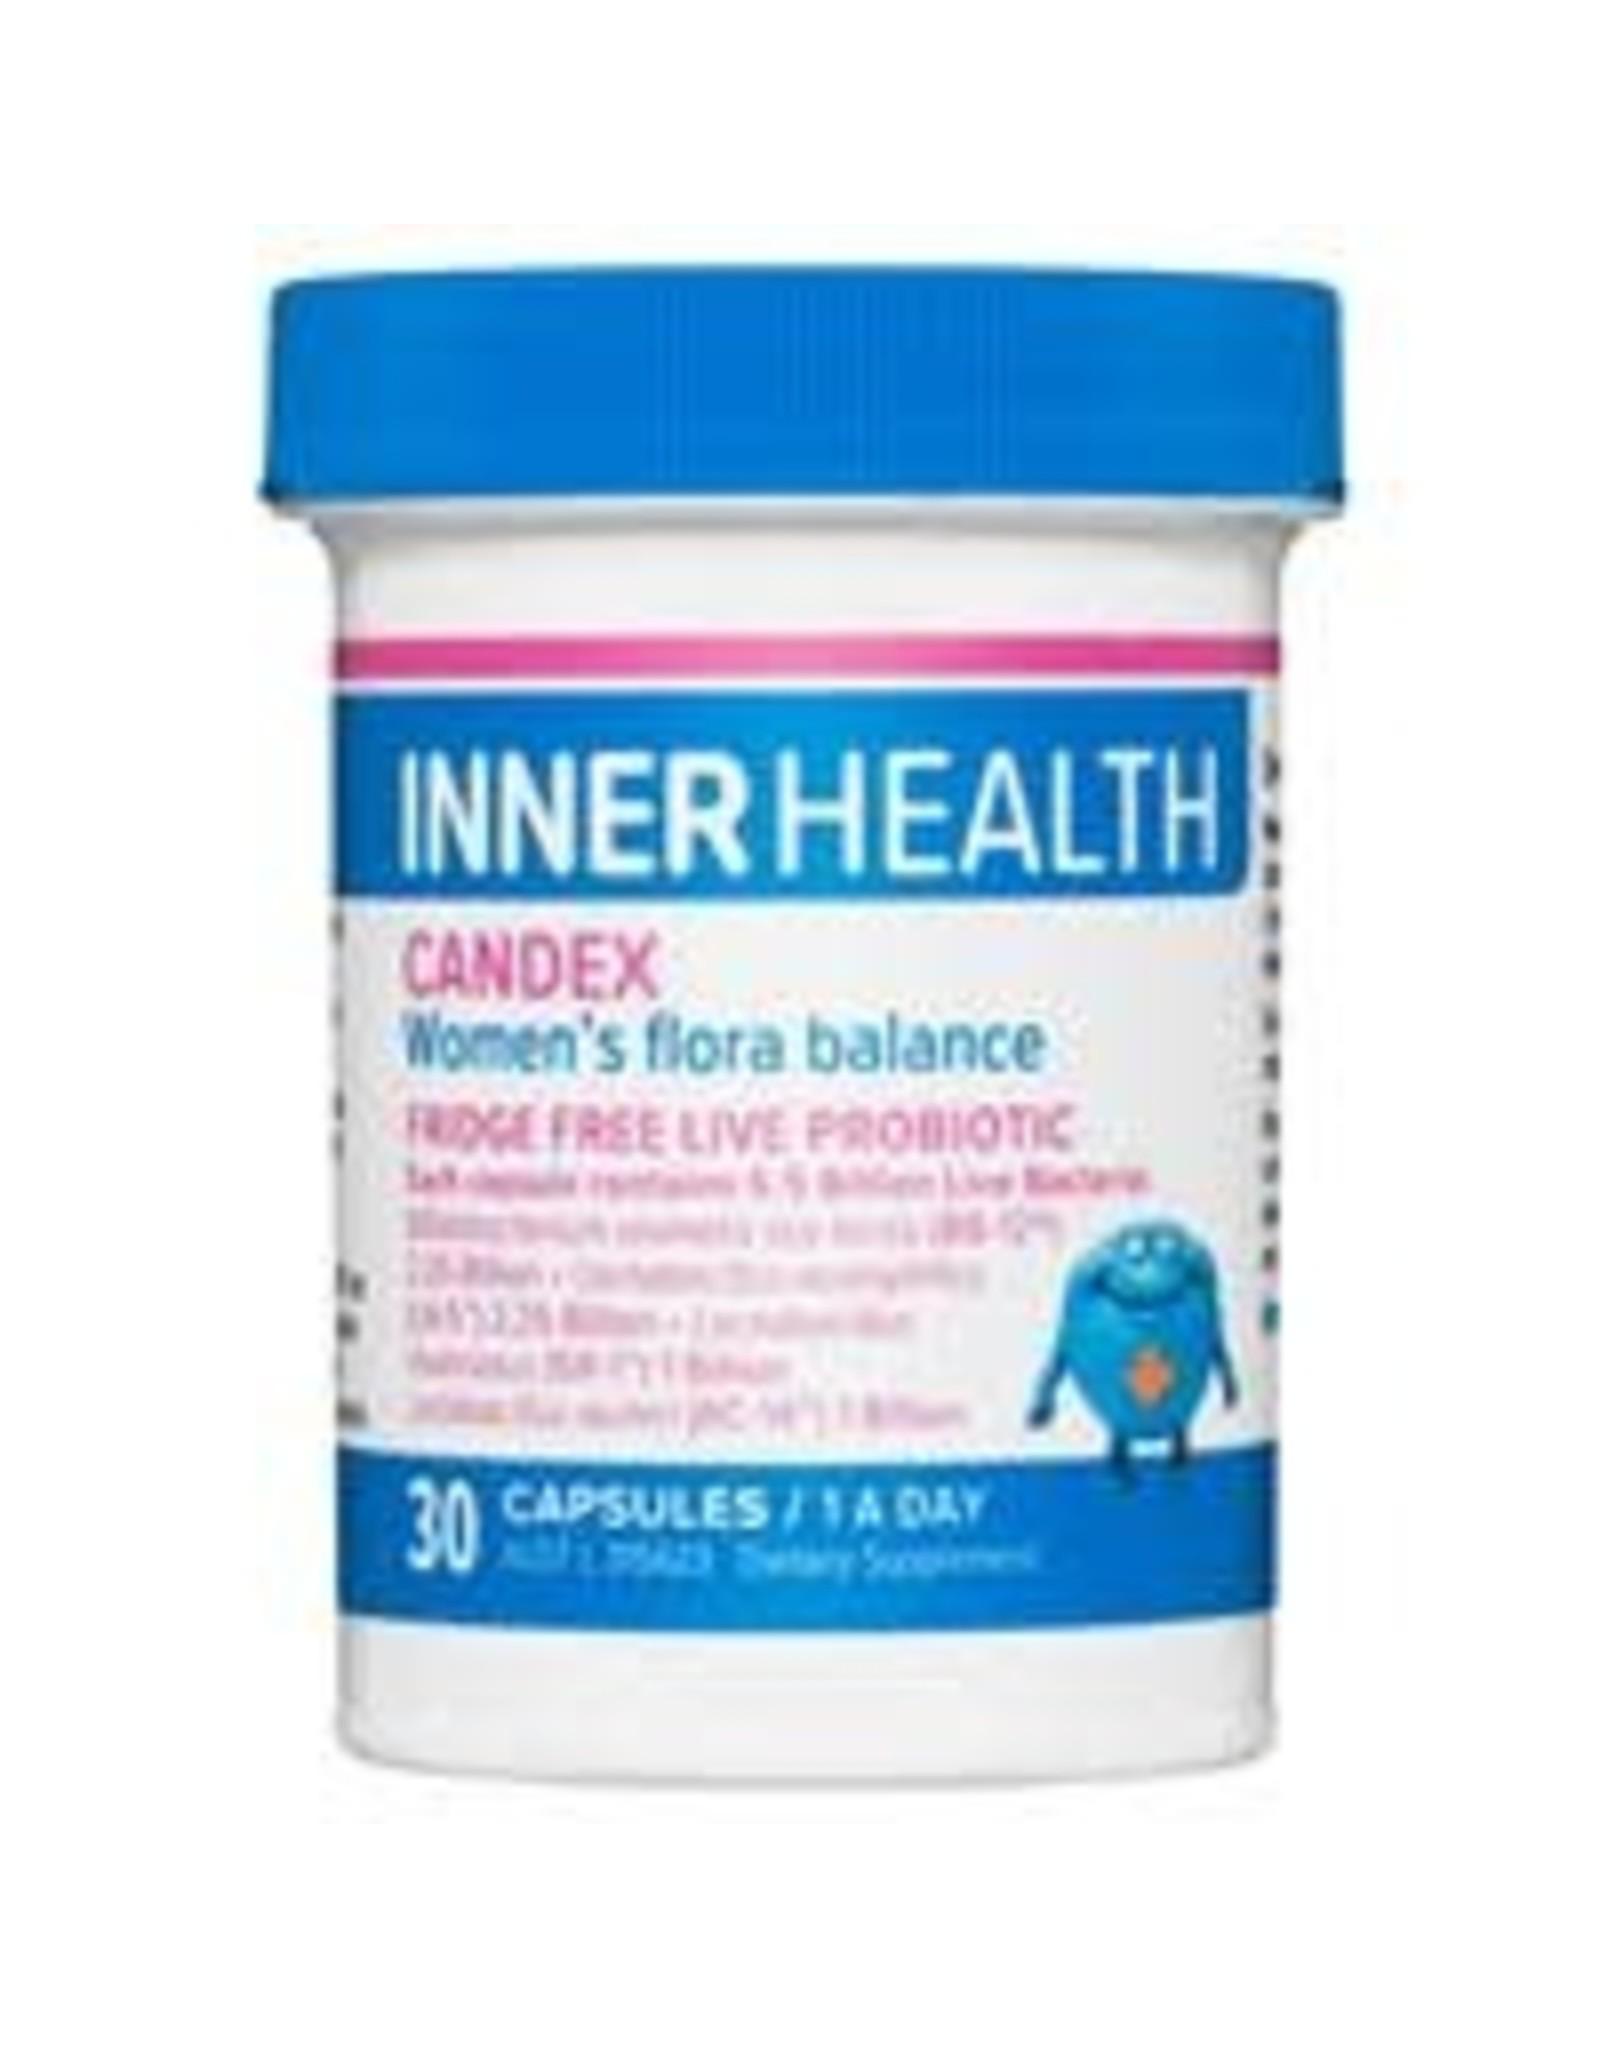 Inner Health Candex 30c